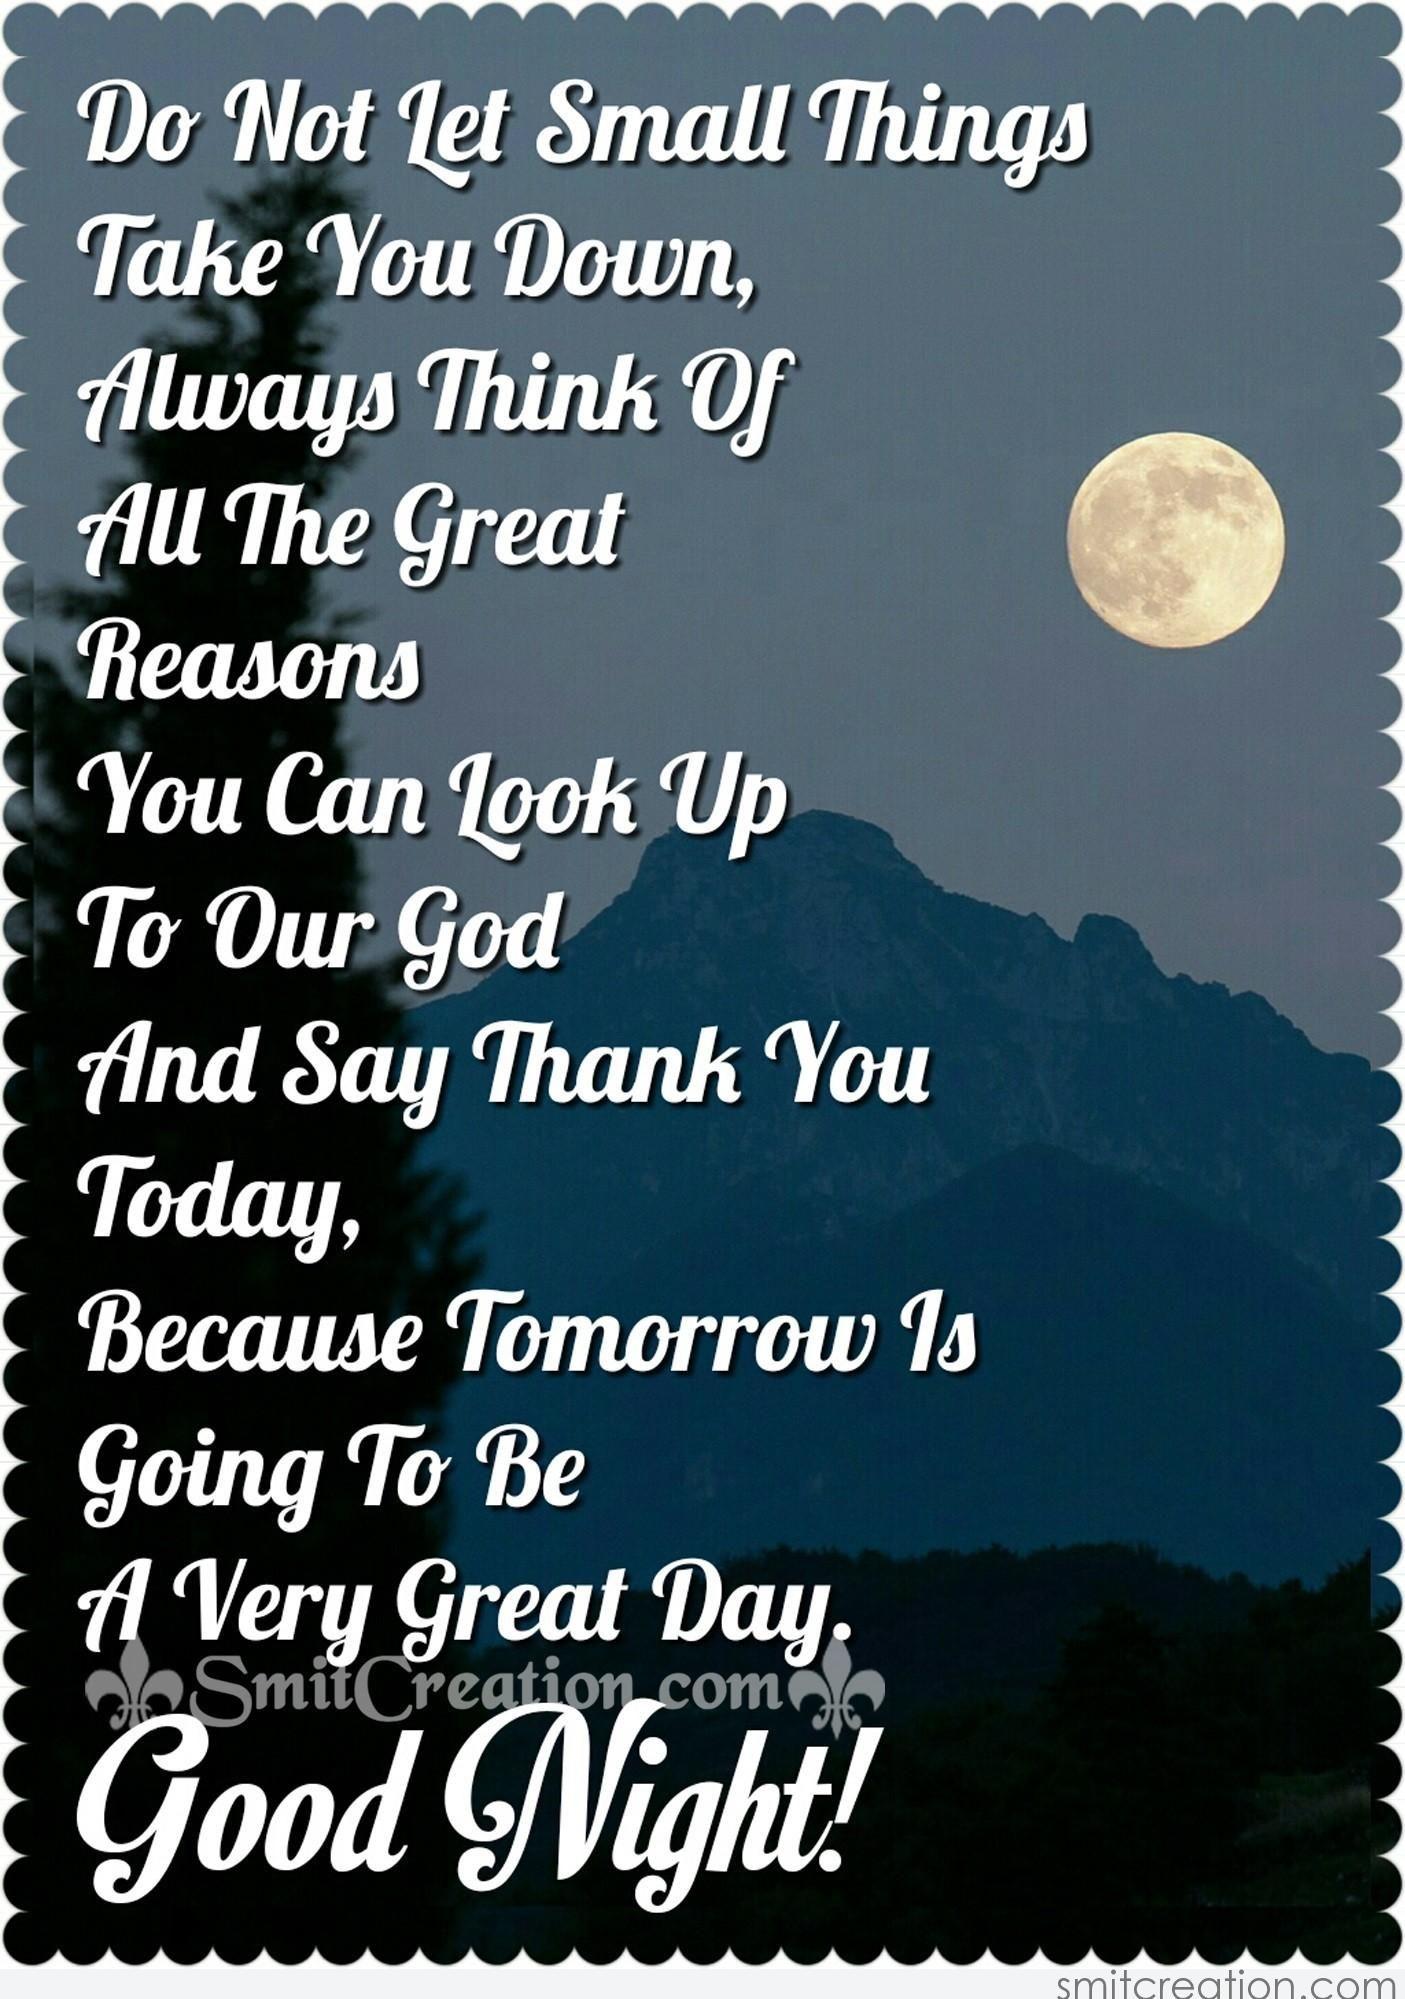 GoodNight #astroriver  Good night quotes, Goodnight quotes